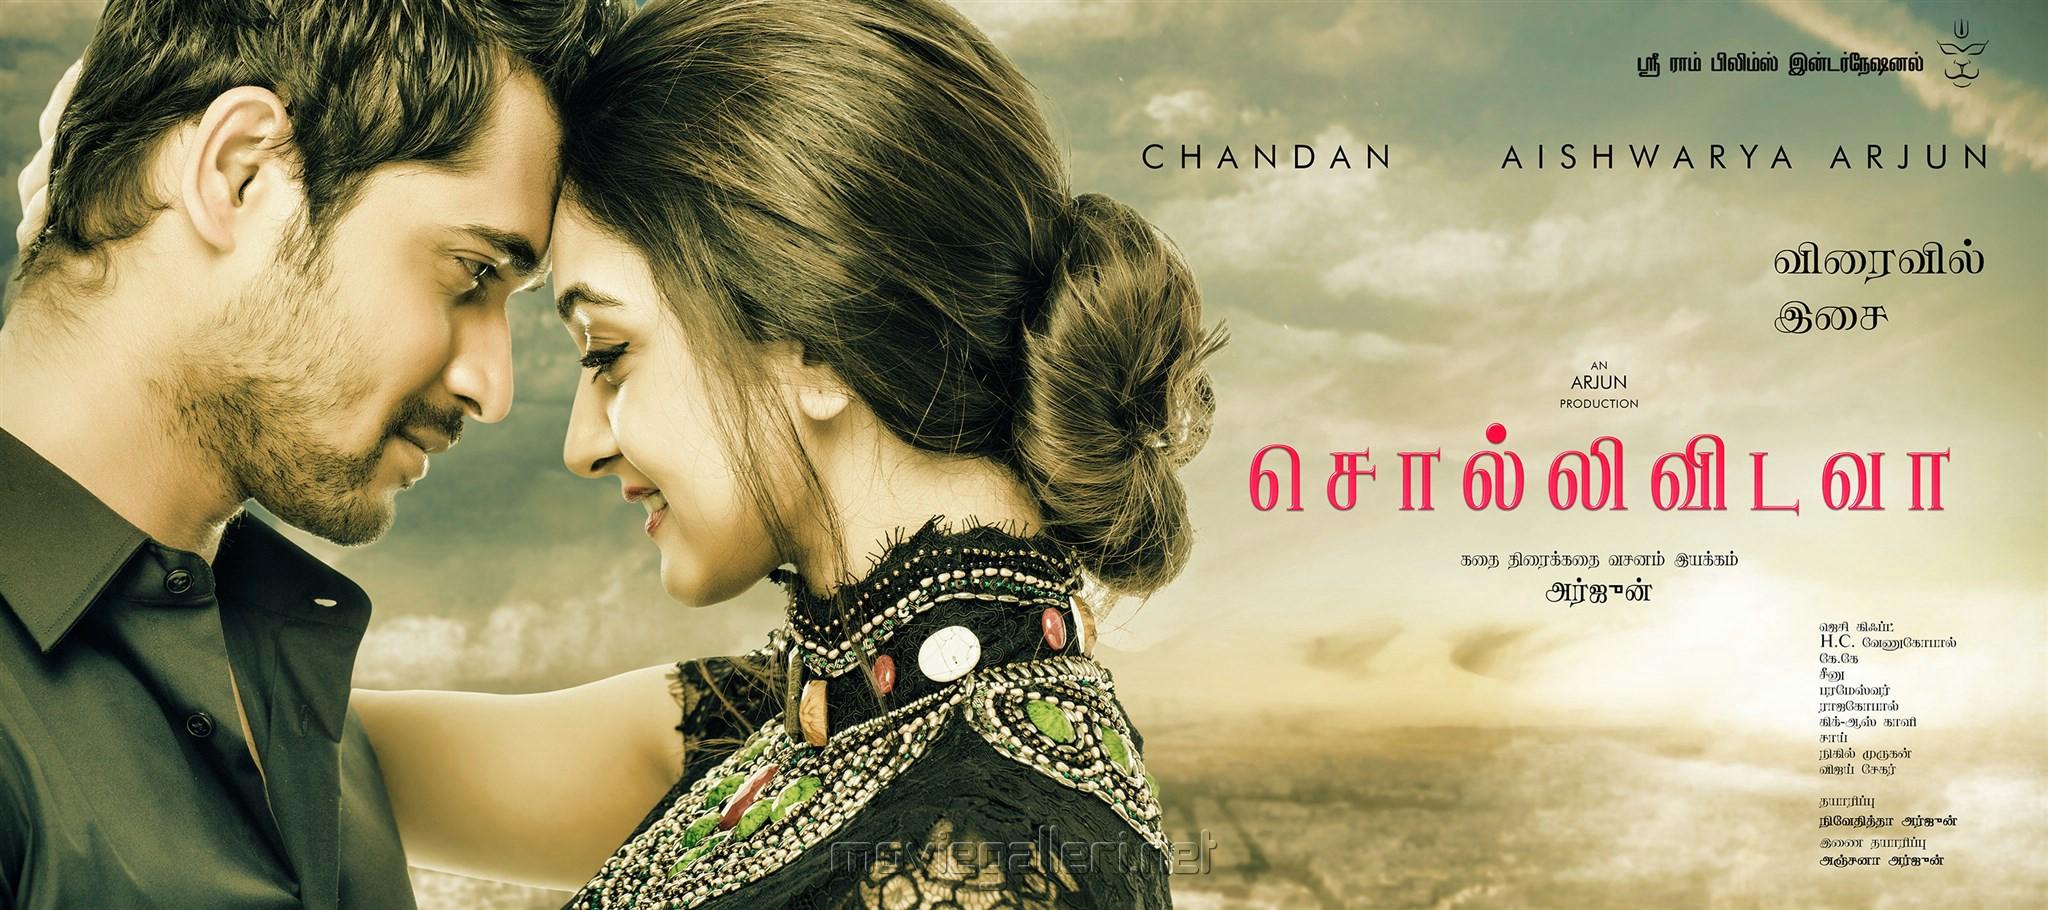 Chandan Kumar, Aishwarya Arjun in SolliVidava Movie Wallpapers